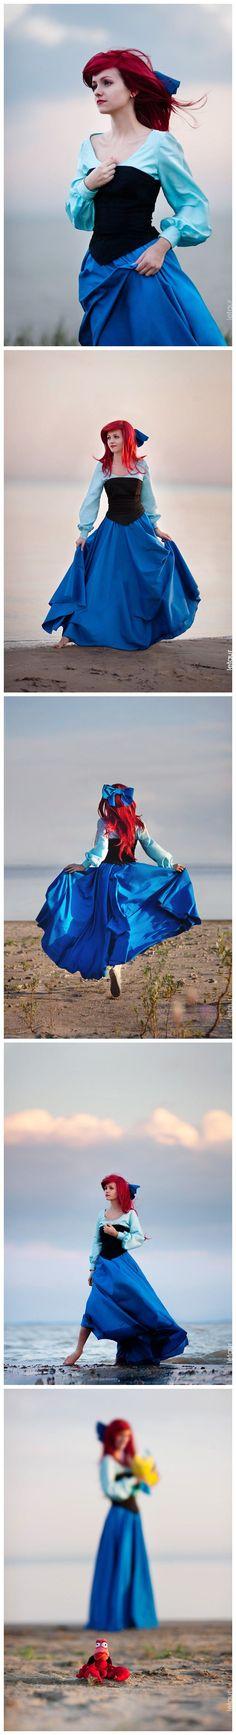 Ariels town dress, Disneys The Little Mermaid #camiseta #cosplayer 2#camisetagratis #cosplay #friki #regalos #ofertas #ropaoferta